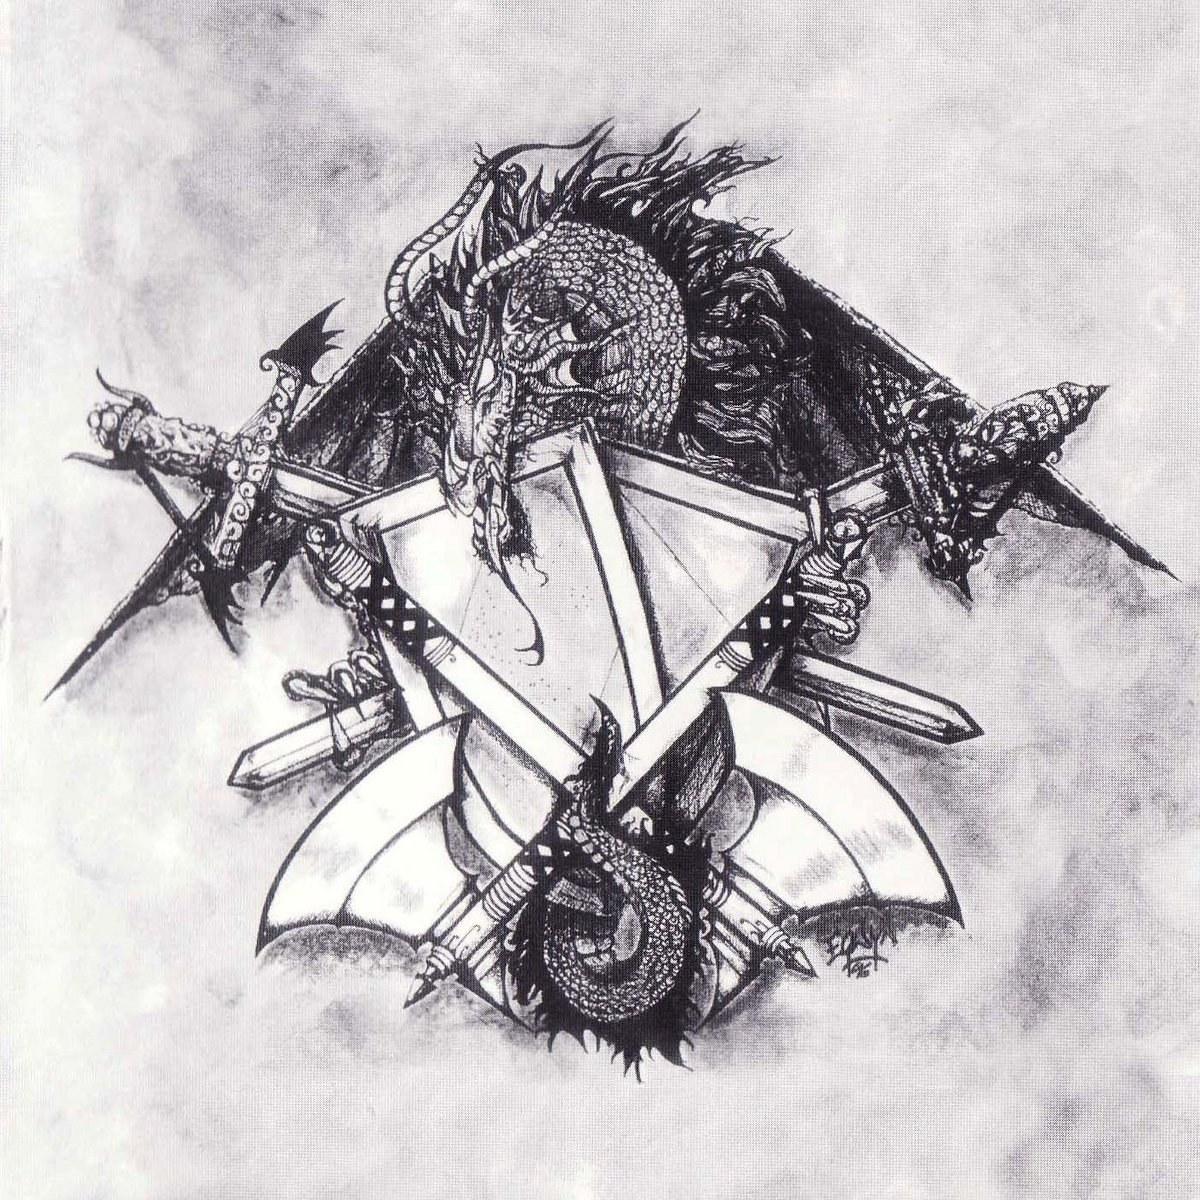 Review for Primigenium - Art of War